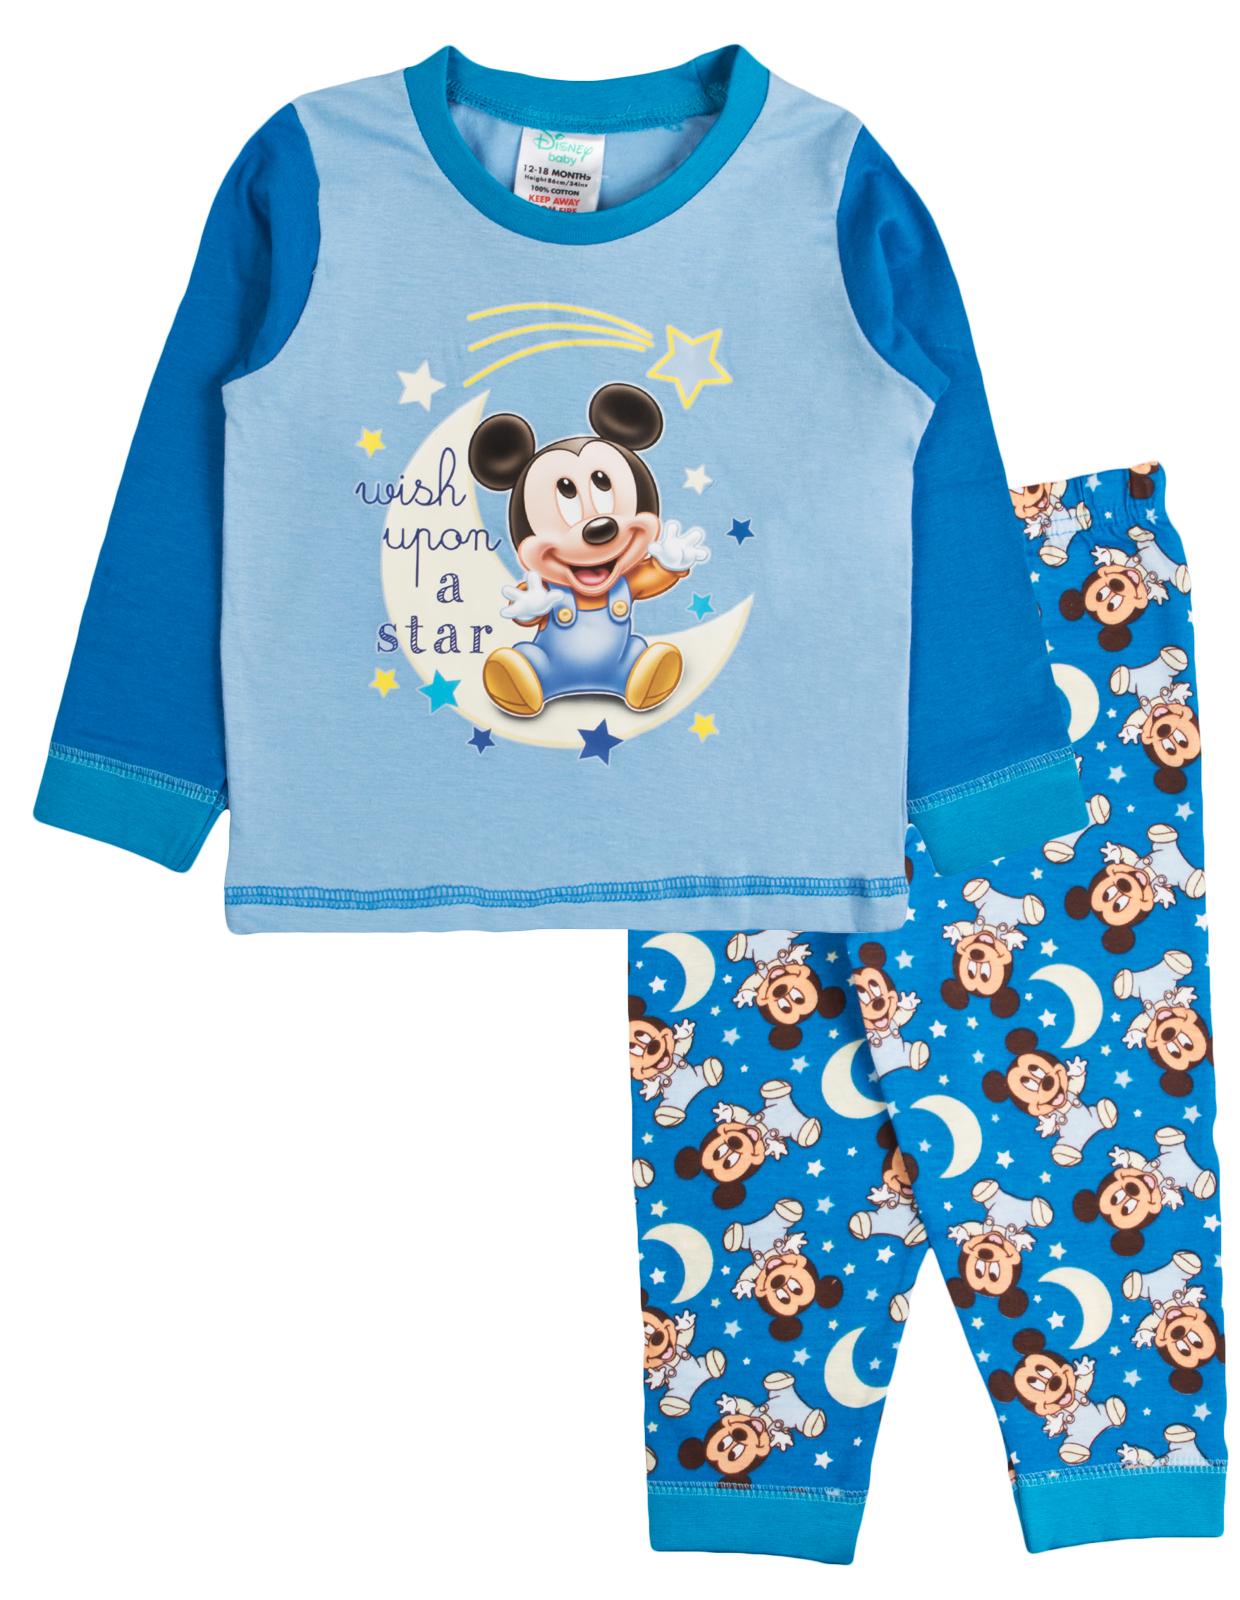 13100b6f4e4b Baby Boys Pyjamas Kids Toddlers Disney Mickey Mouse Pjs Clubhouse ...